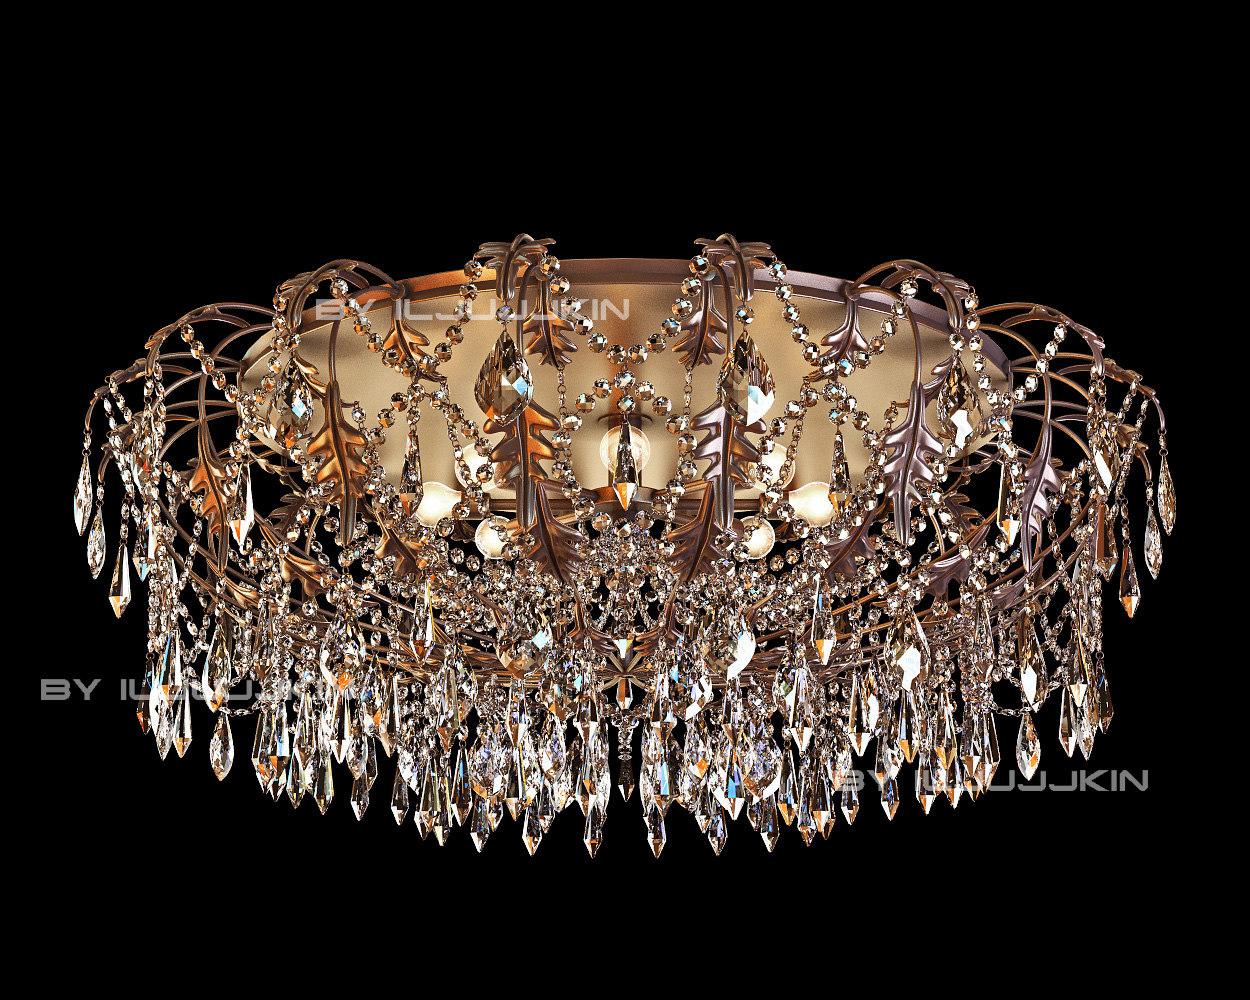 lampadari brilliant : chandelier mm lampadari 6696 3d model